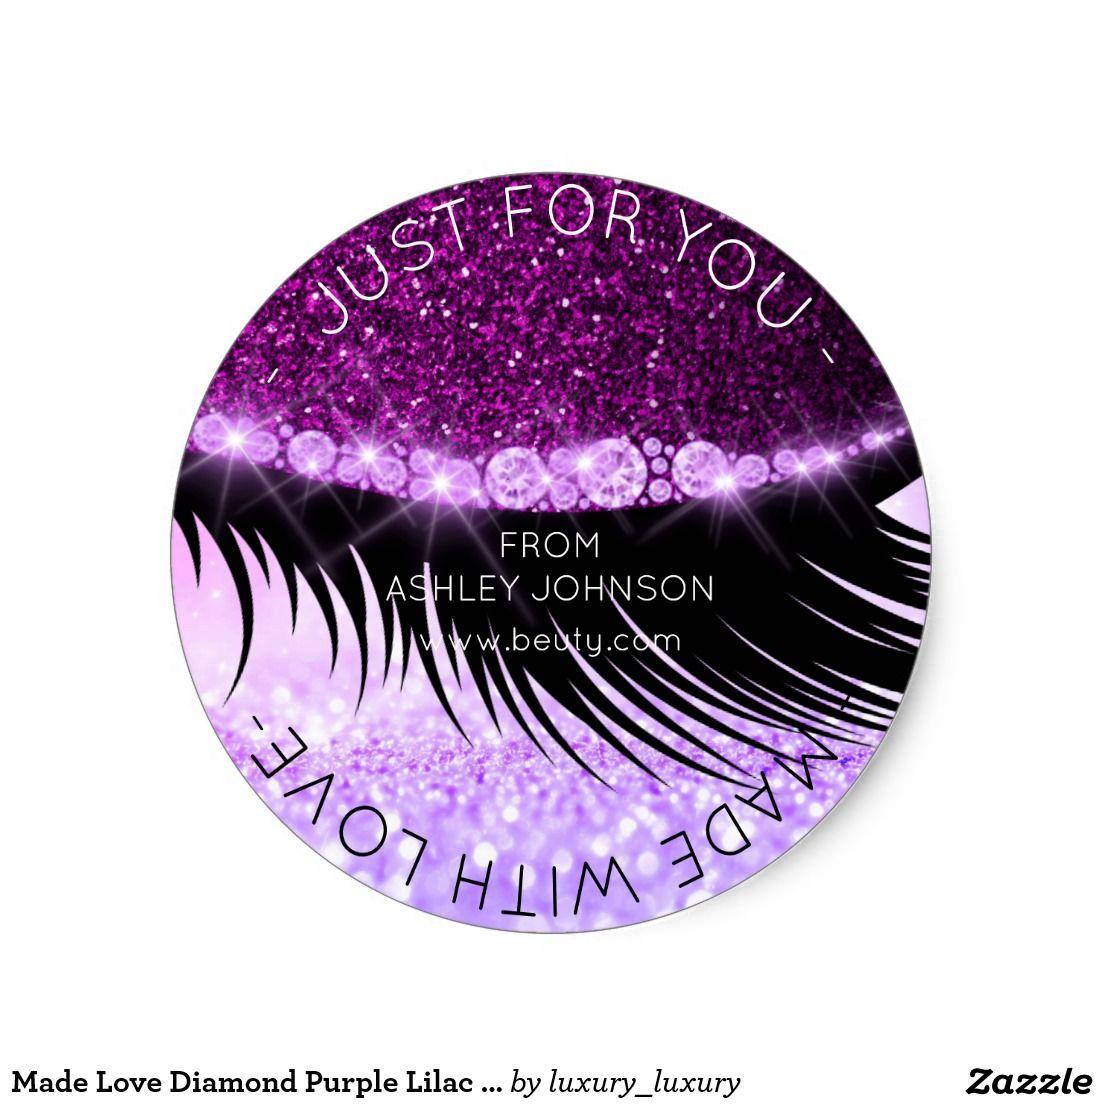 Made Love Diamond Purple Lilac Vip Sparkly Glitter Round Sticker